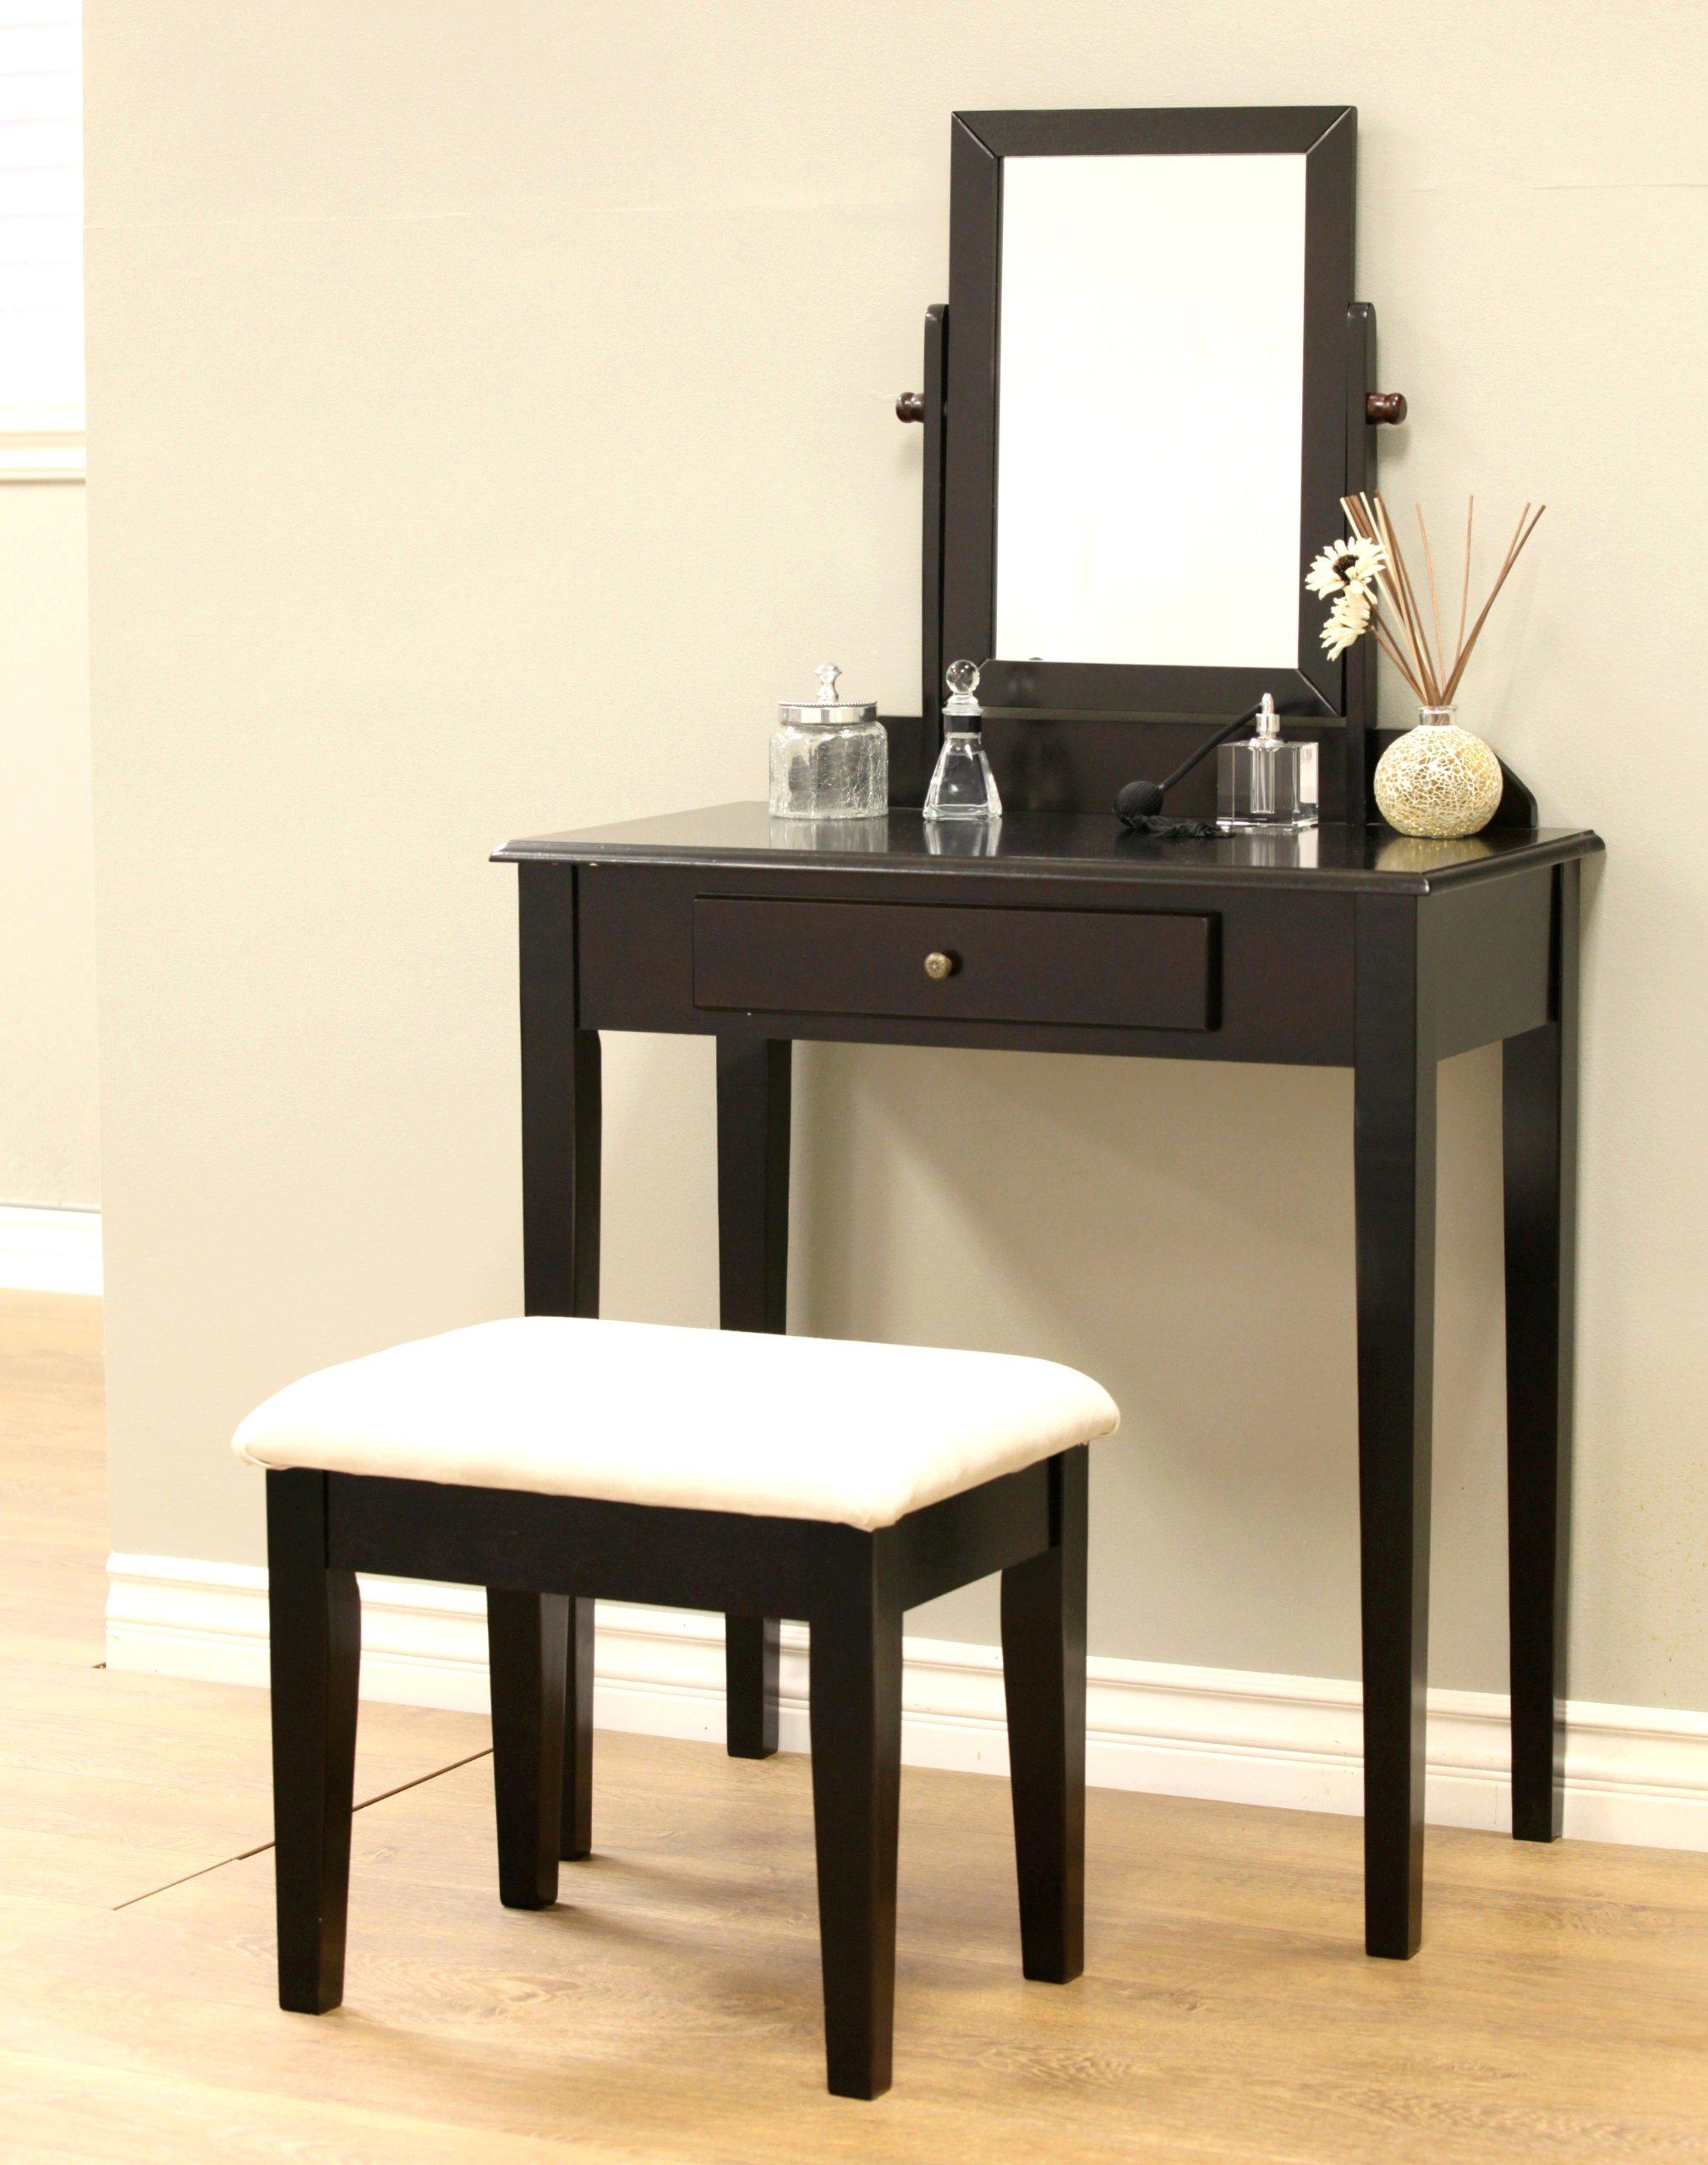 Frenchi Home Furnishing 3 Piece Vanity Set, Espresso Finish, Expresso